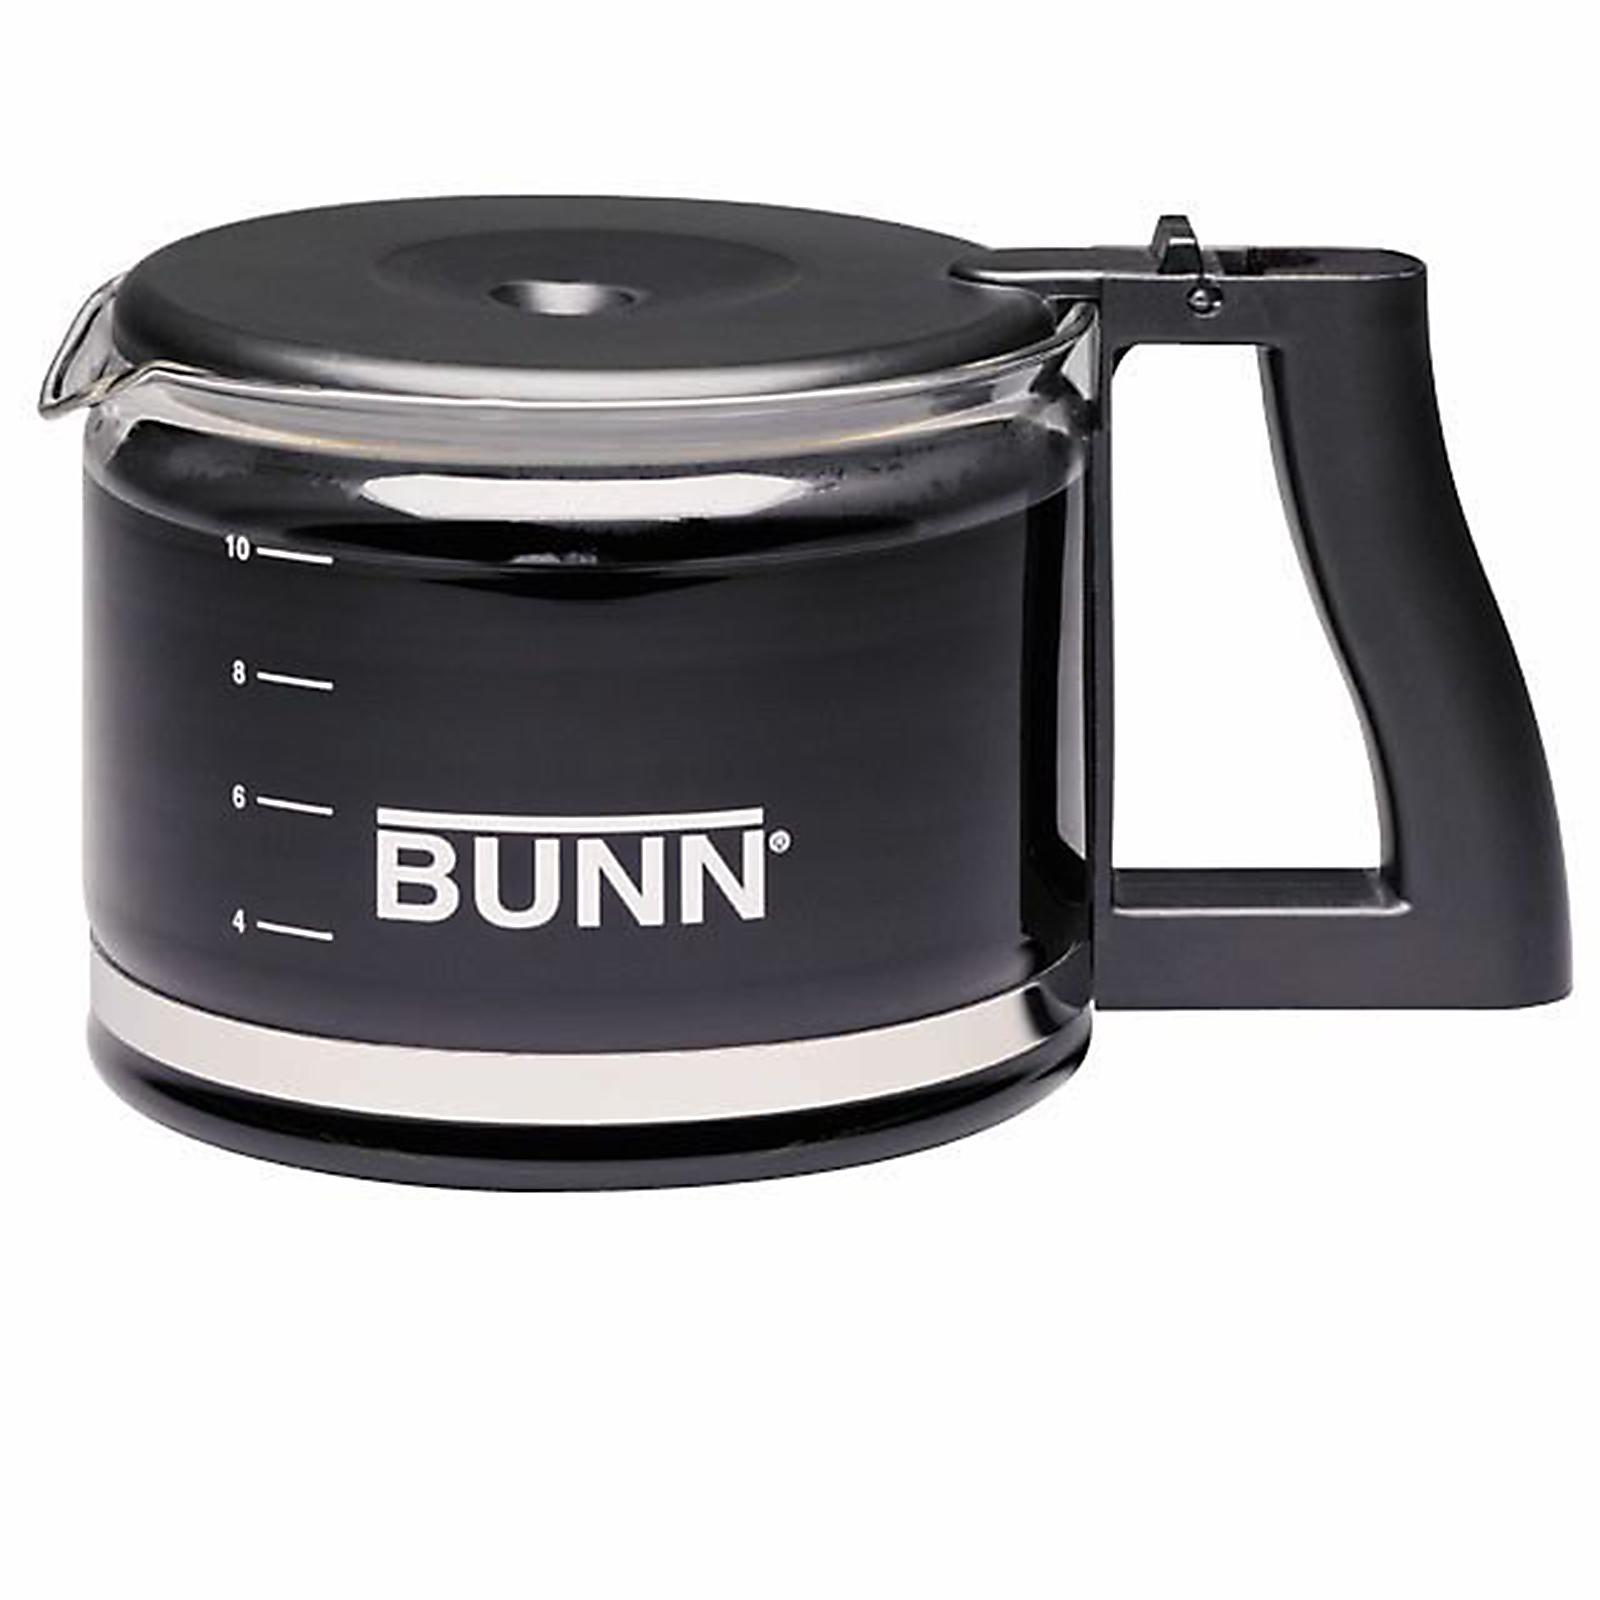 BUNN 10 CUP COFFEE DECANTER